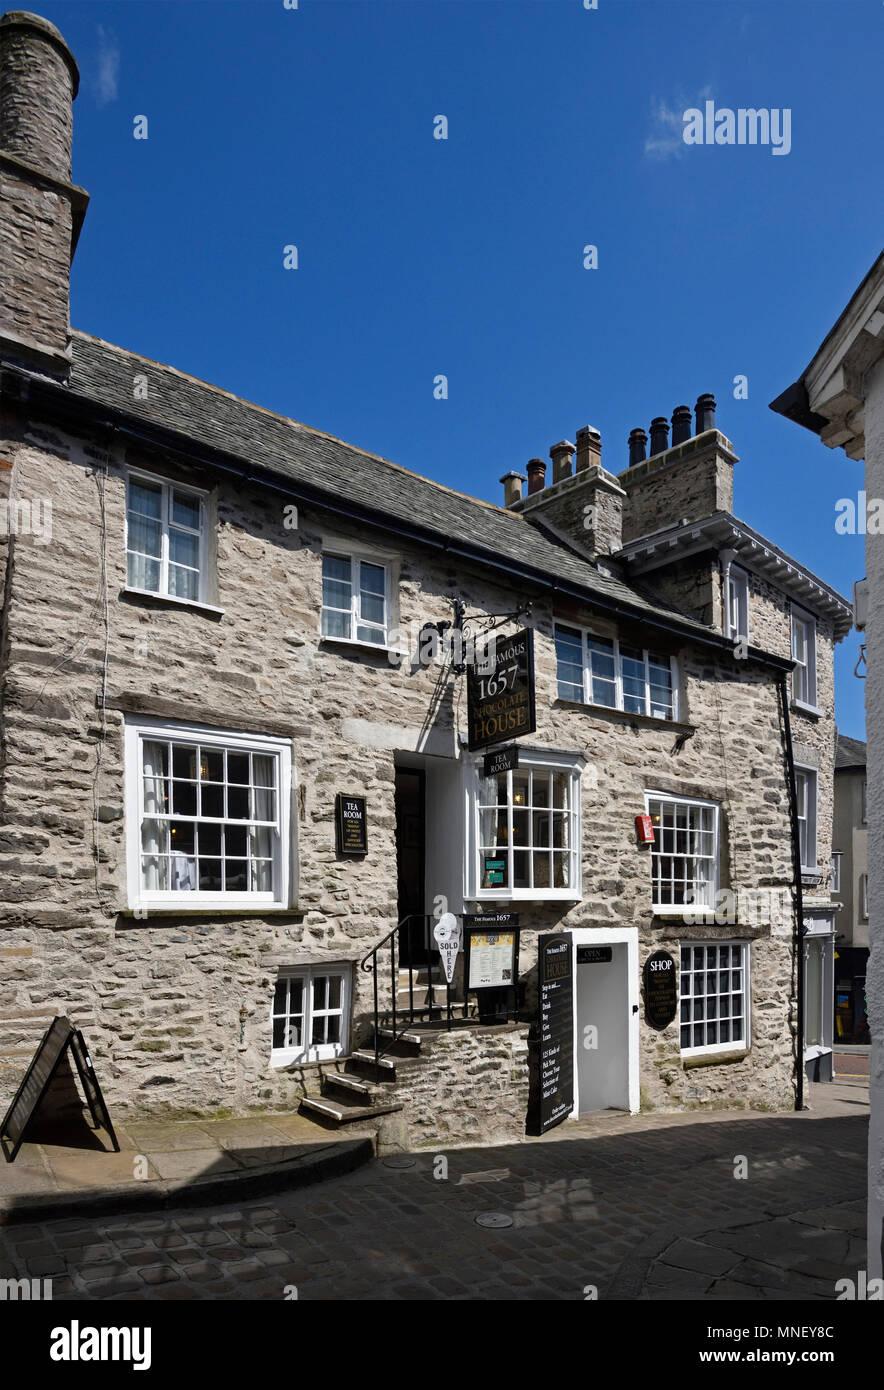 The Famous 1657 Chocolate House, Branthwaite Brow, Kendal, Cumbria, England, United Kingdom, Europe. - Stock Image